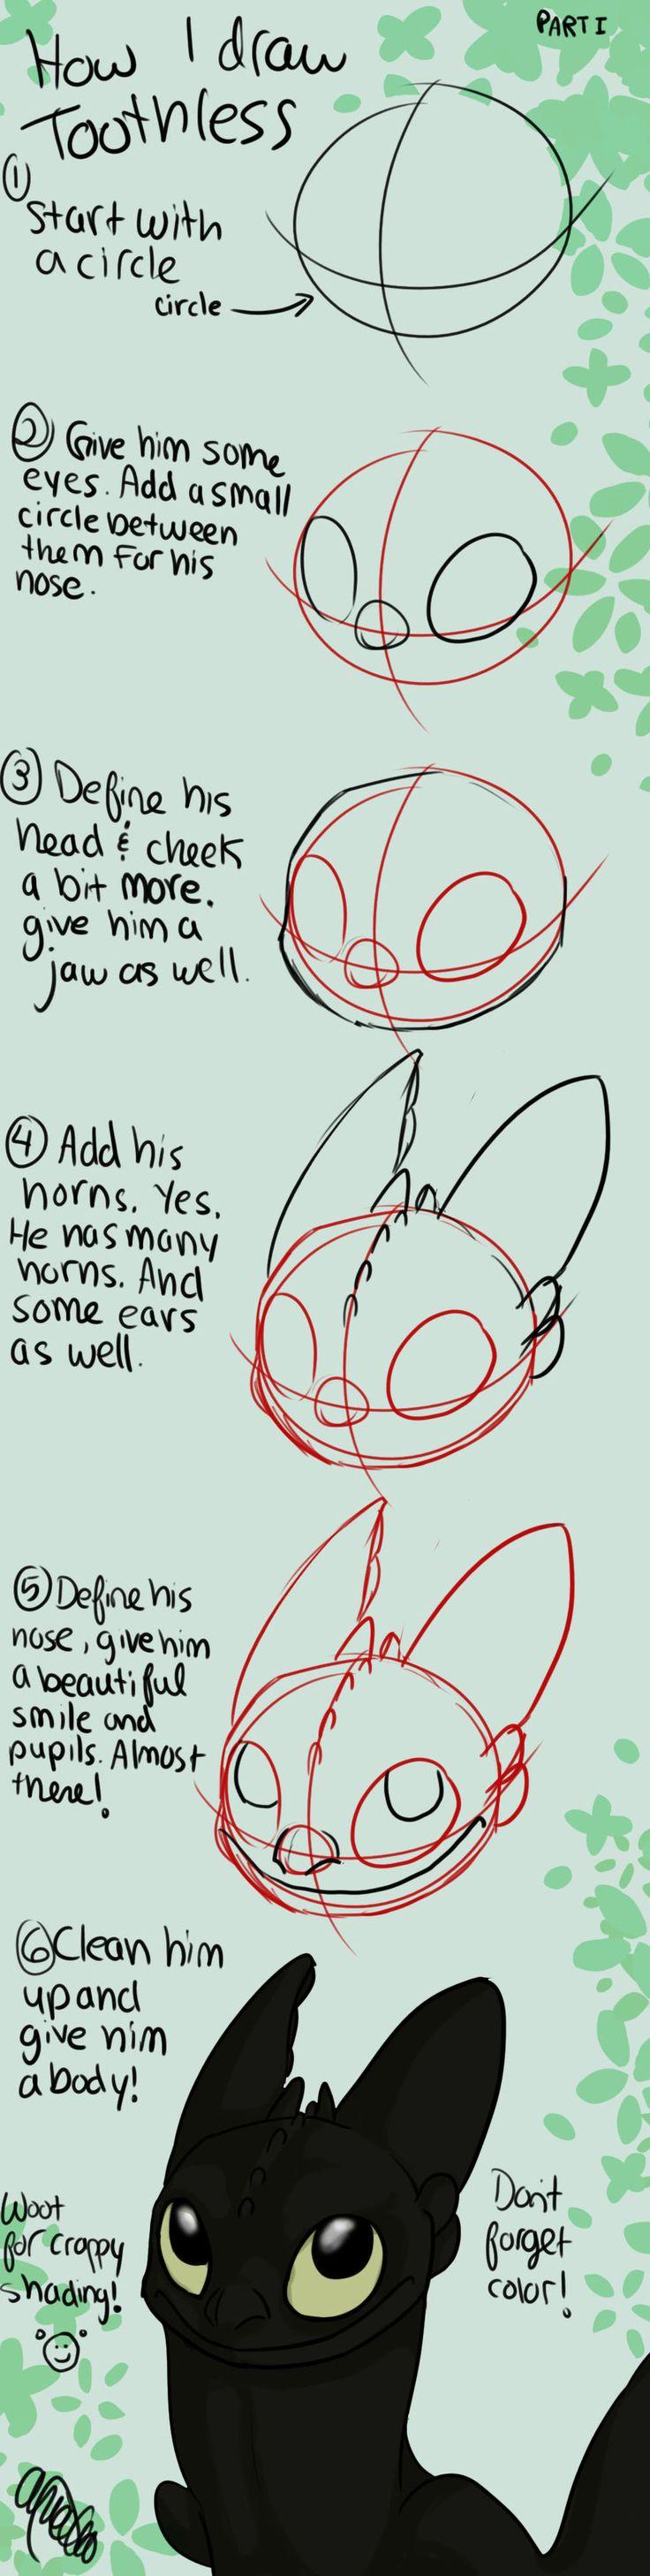 How to Draw Toothless Tutorial by Spiritwollf.deviantart.com on @deviantART